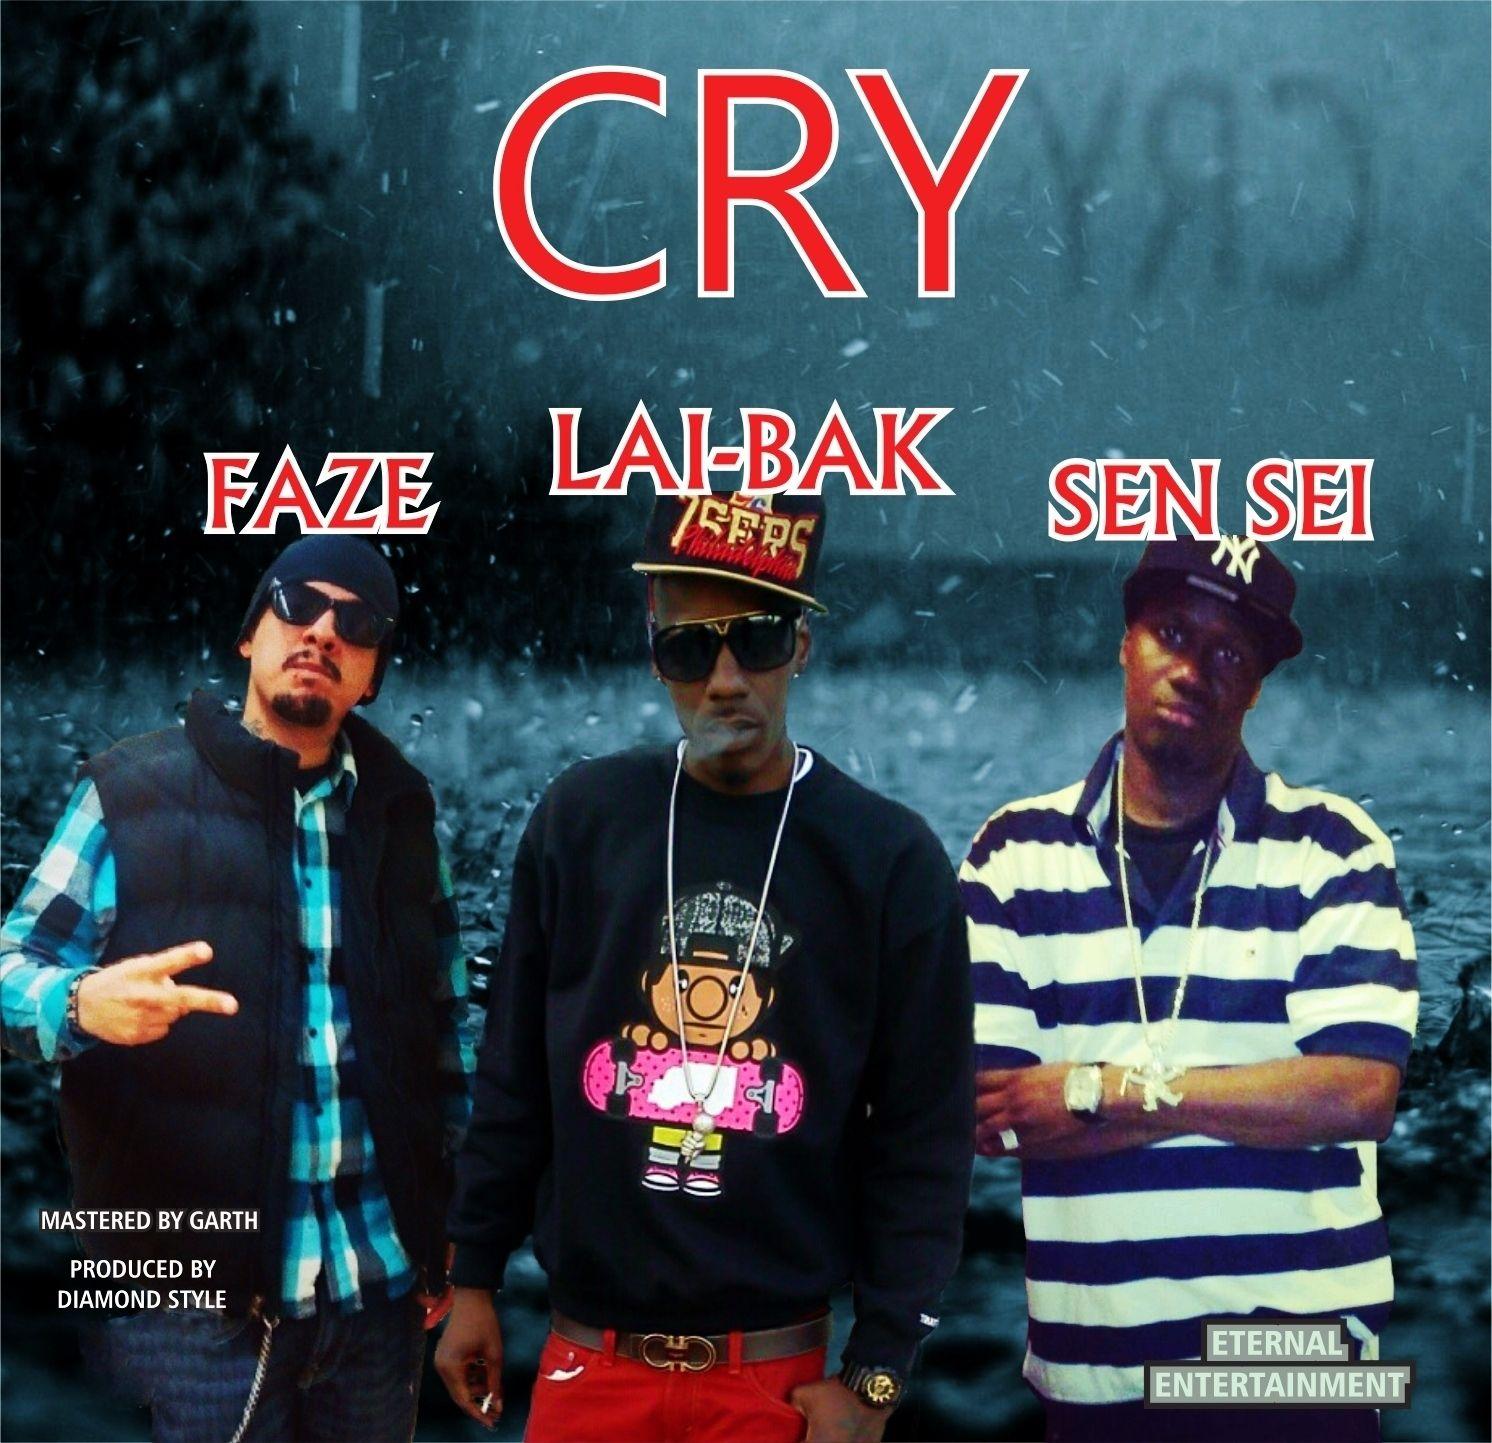 Oryhan Lai Lai Audio Song Free Download Of: Cry Ft. Faze & Sen Sei Uploaded By Lai-Bak